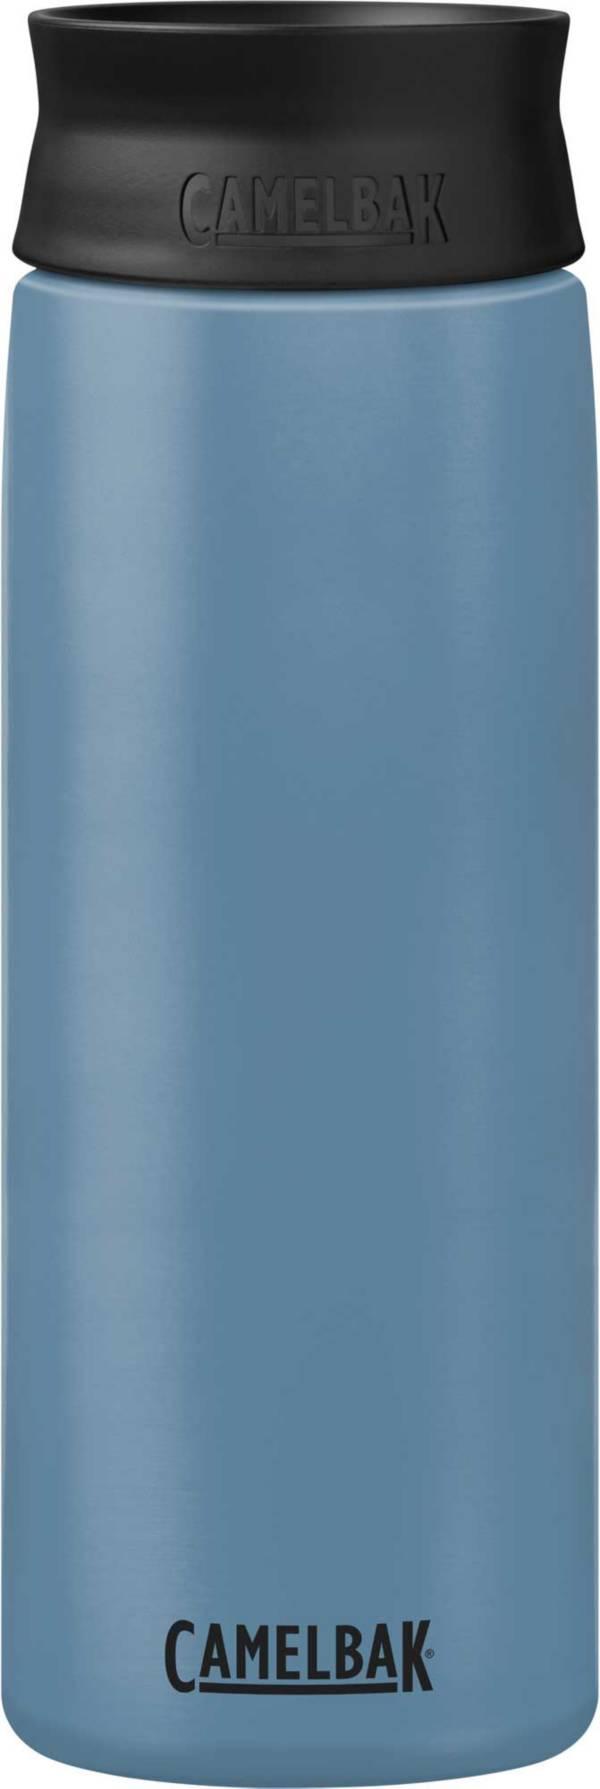 Camelbak Hot Cap 20 oz. Insulated Bottle product image